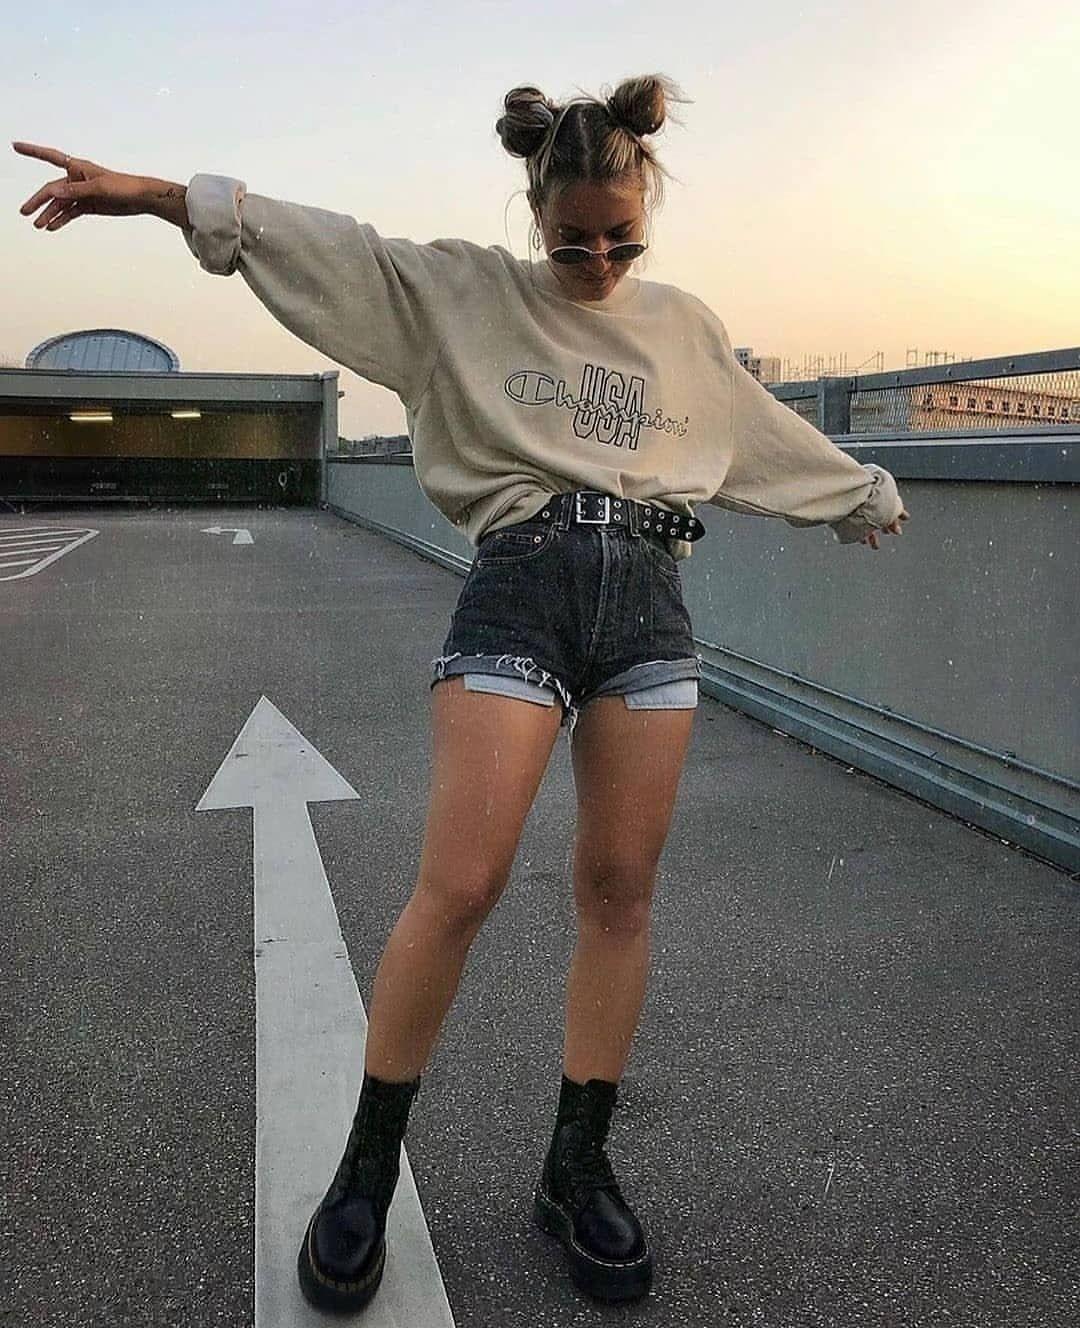 #grungegirl #urbanfashion #urbanwear #fashionova #